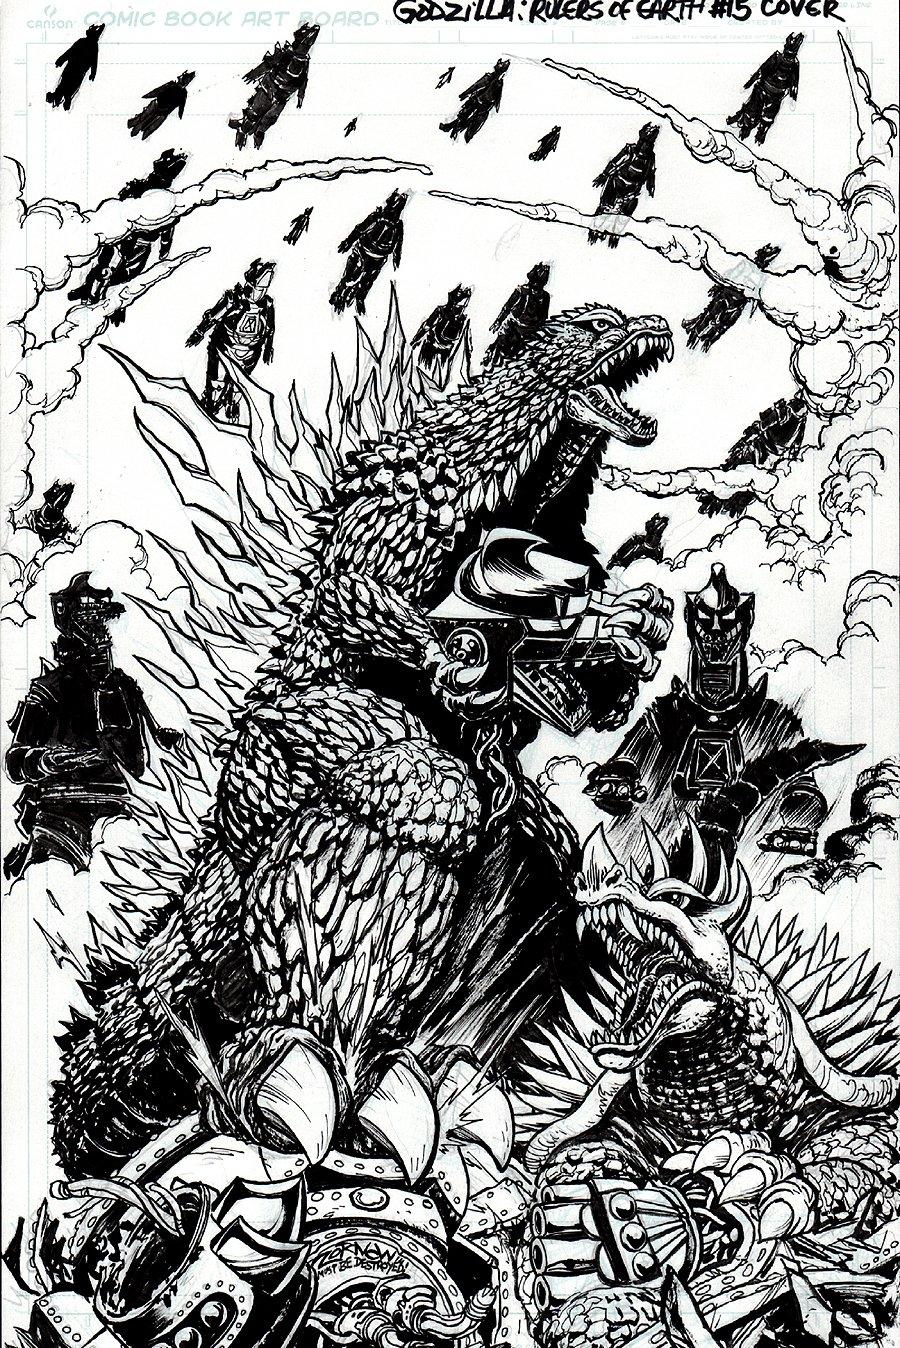 Godzilla: Rulers of Earth #15 Cover (2014)